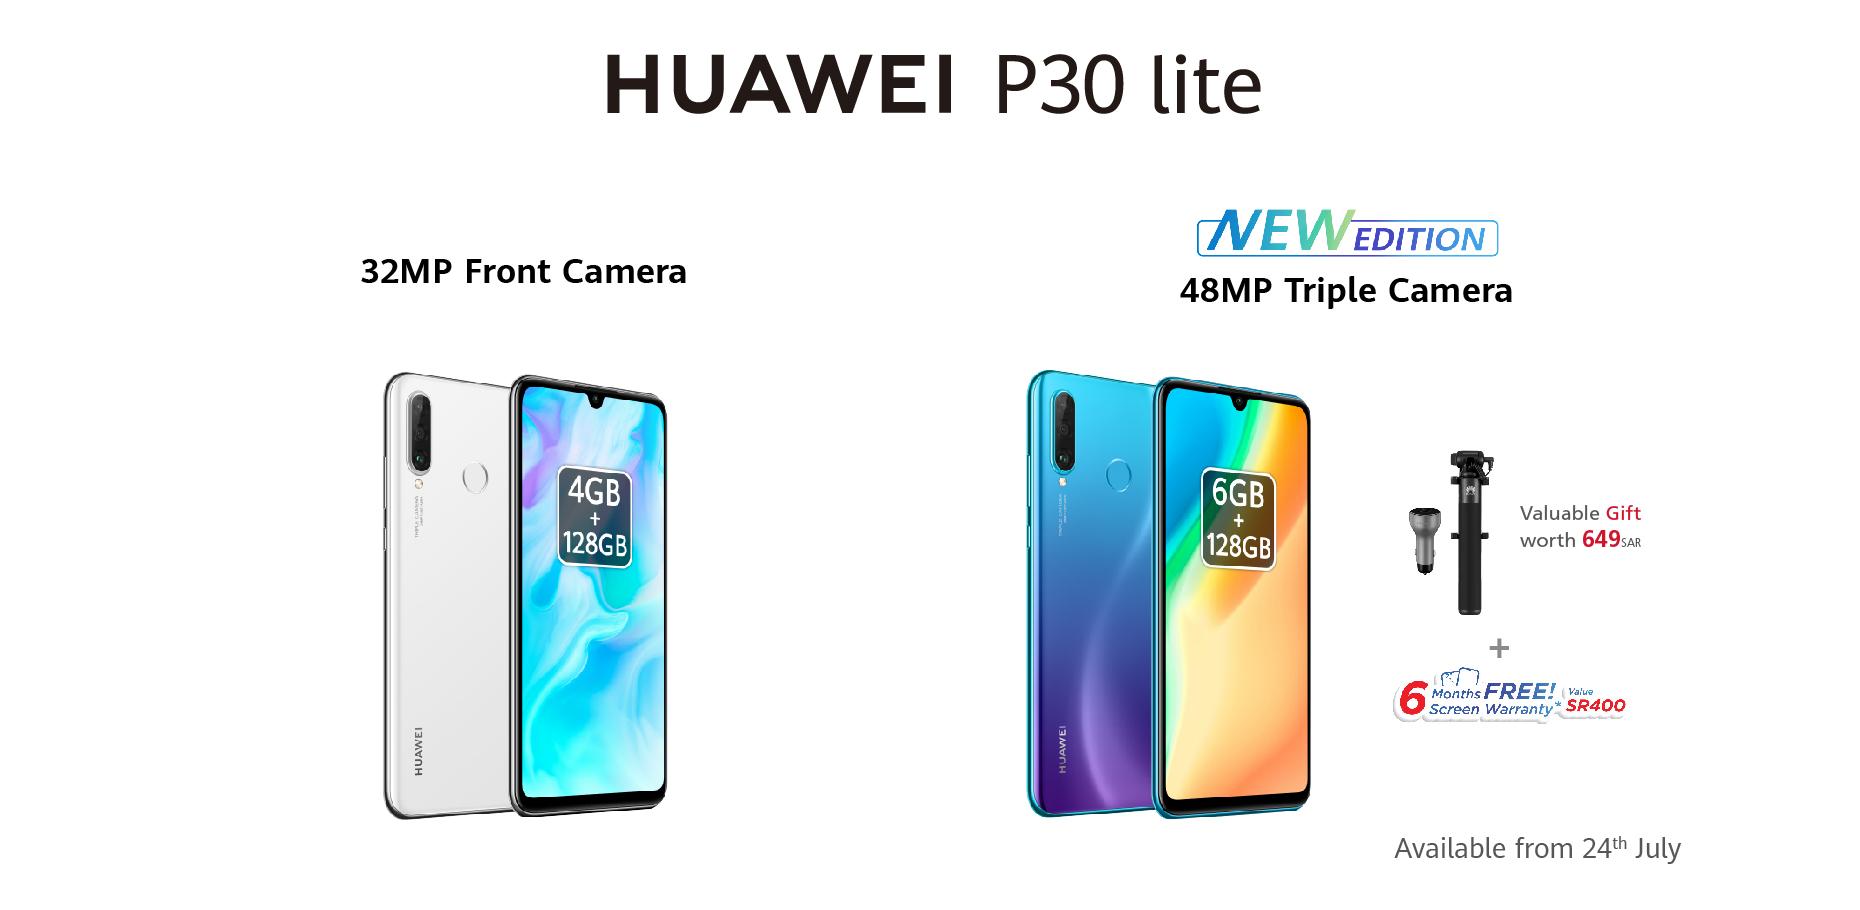 HUAWEI P30 lite, 3D Curved Glass Design, 3D Selfie Camera   HUAWEI KSA